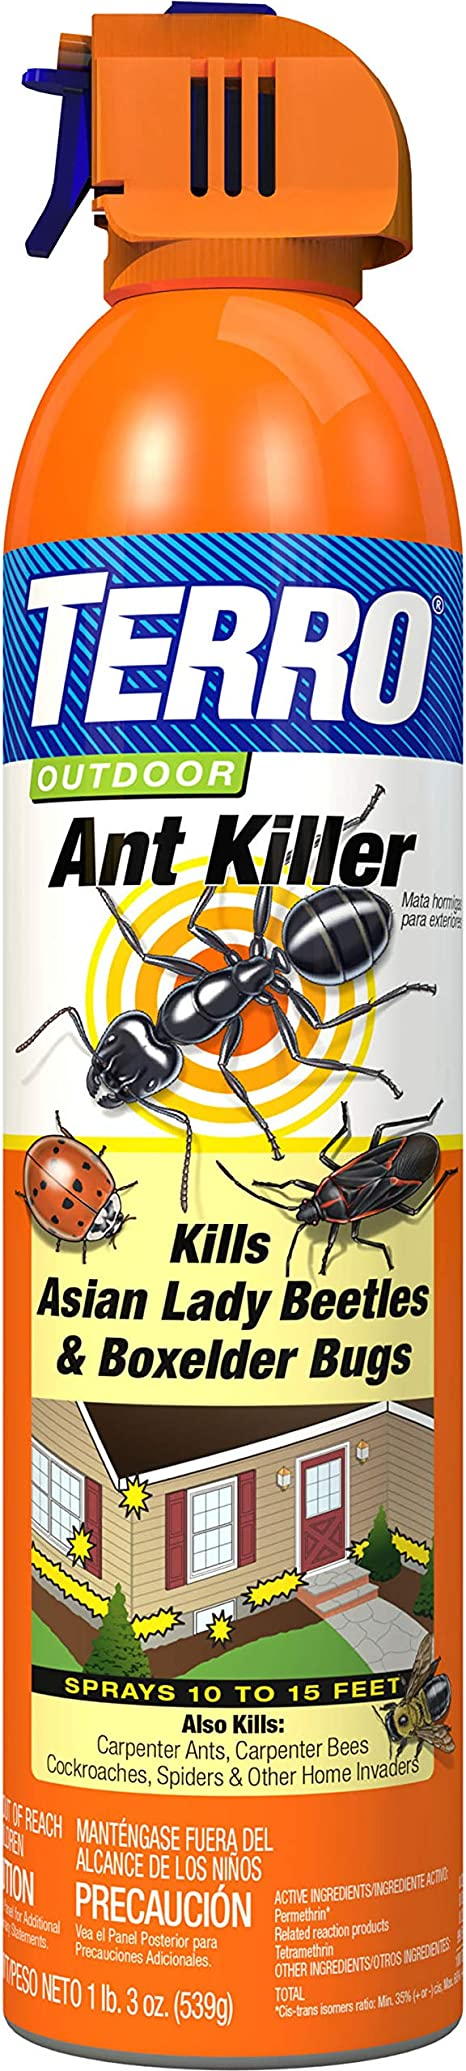 Amazon Com Terro 1700 T1700 19 Oz Outdoor Ant Killer Spray 1 Pack Terro Ant Garden Outdoor